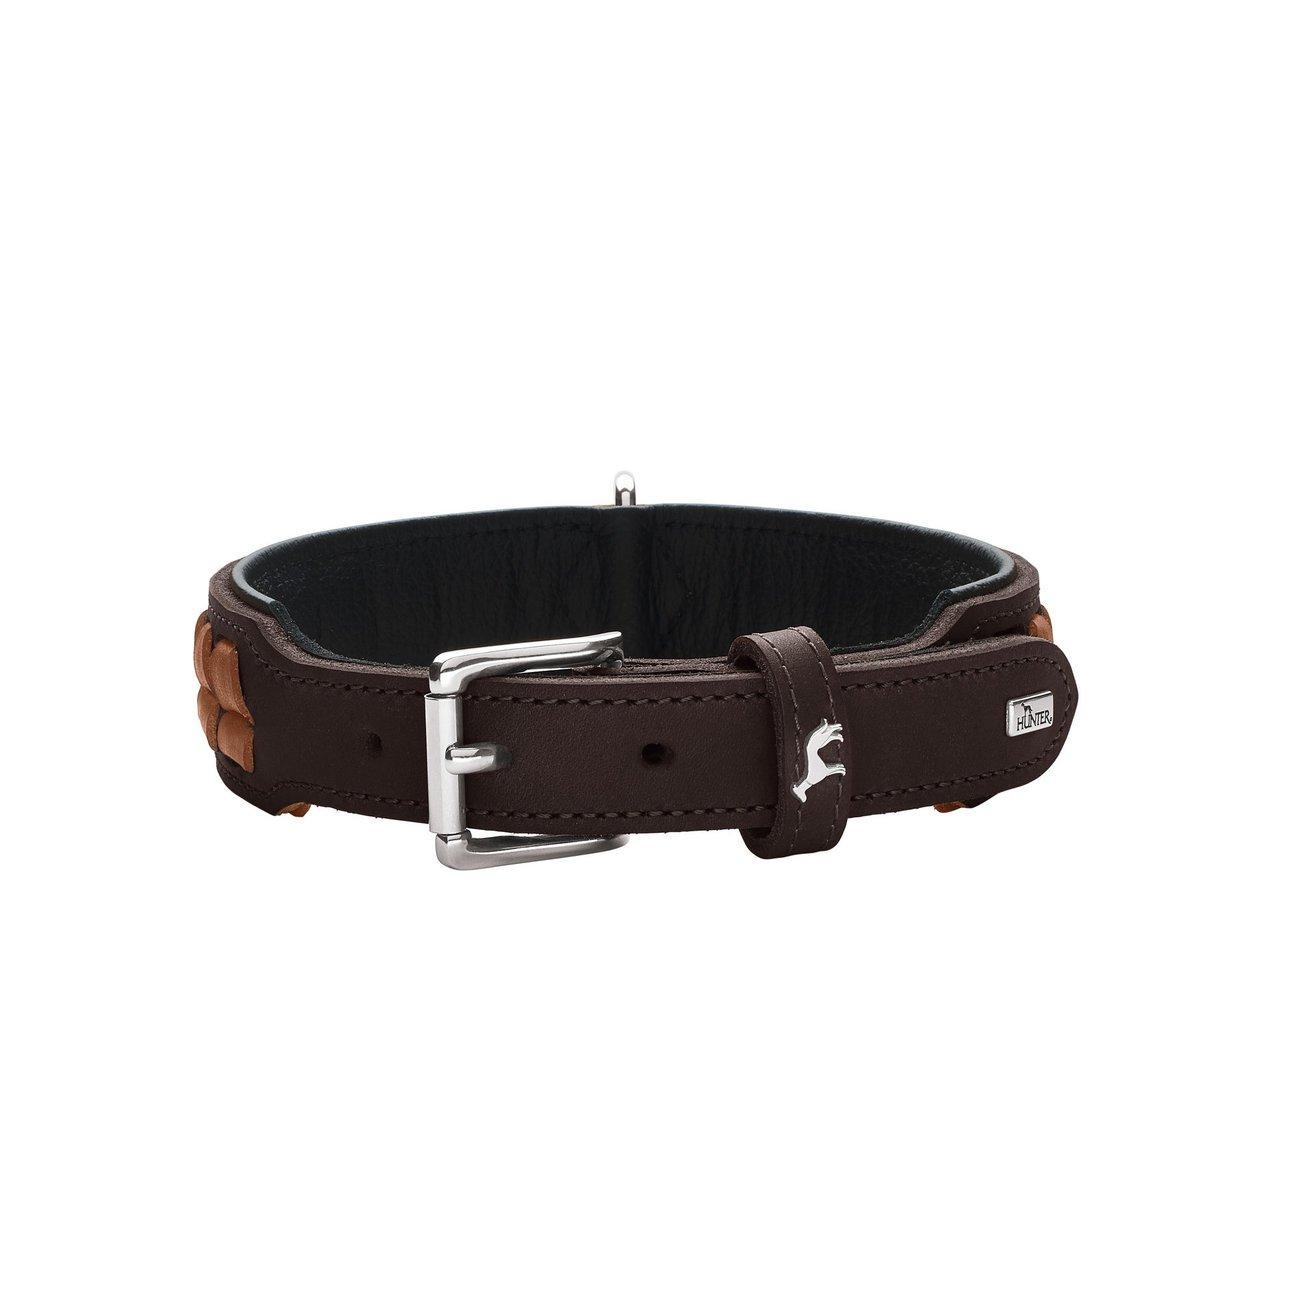 Hunter Hundehalsband El Paso 68555, Bild 11